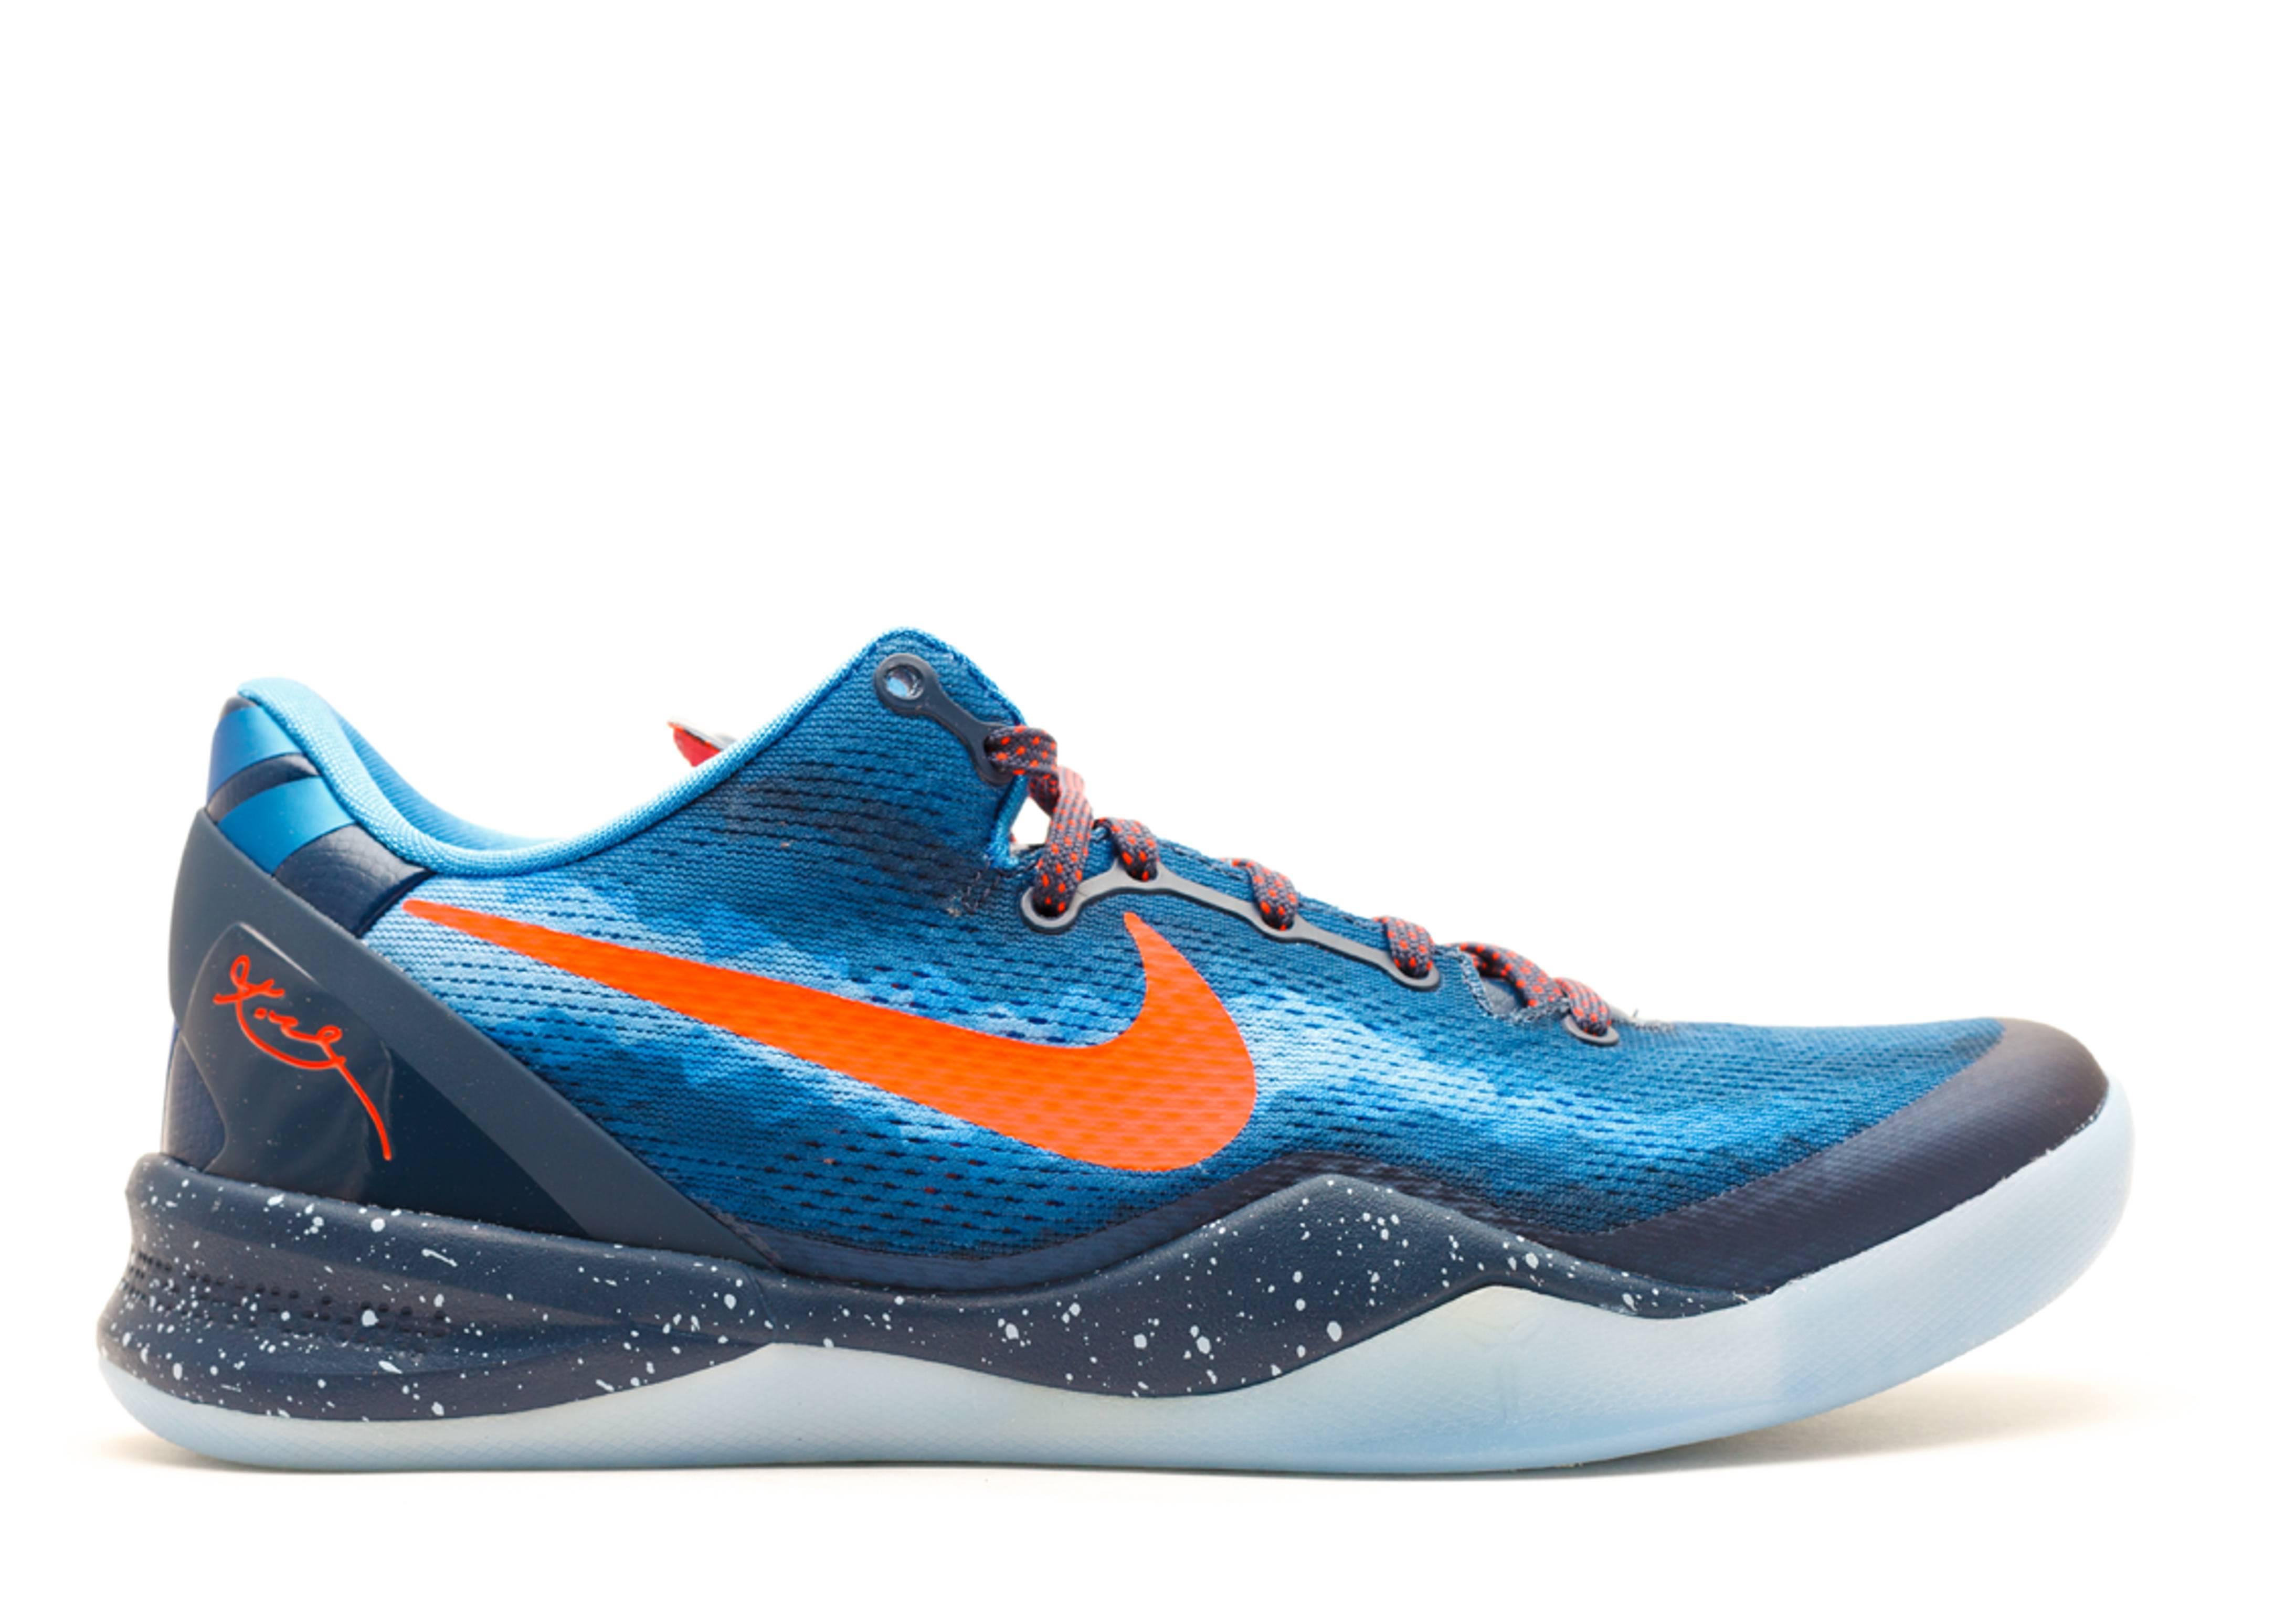 timeless design 1d0f1 6a826 Kobe 8 System - Nike - 555035 401 - blitz blue total crimson ...